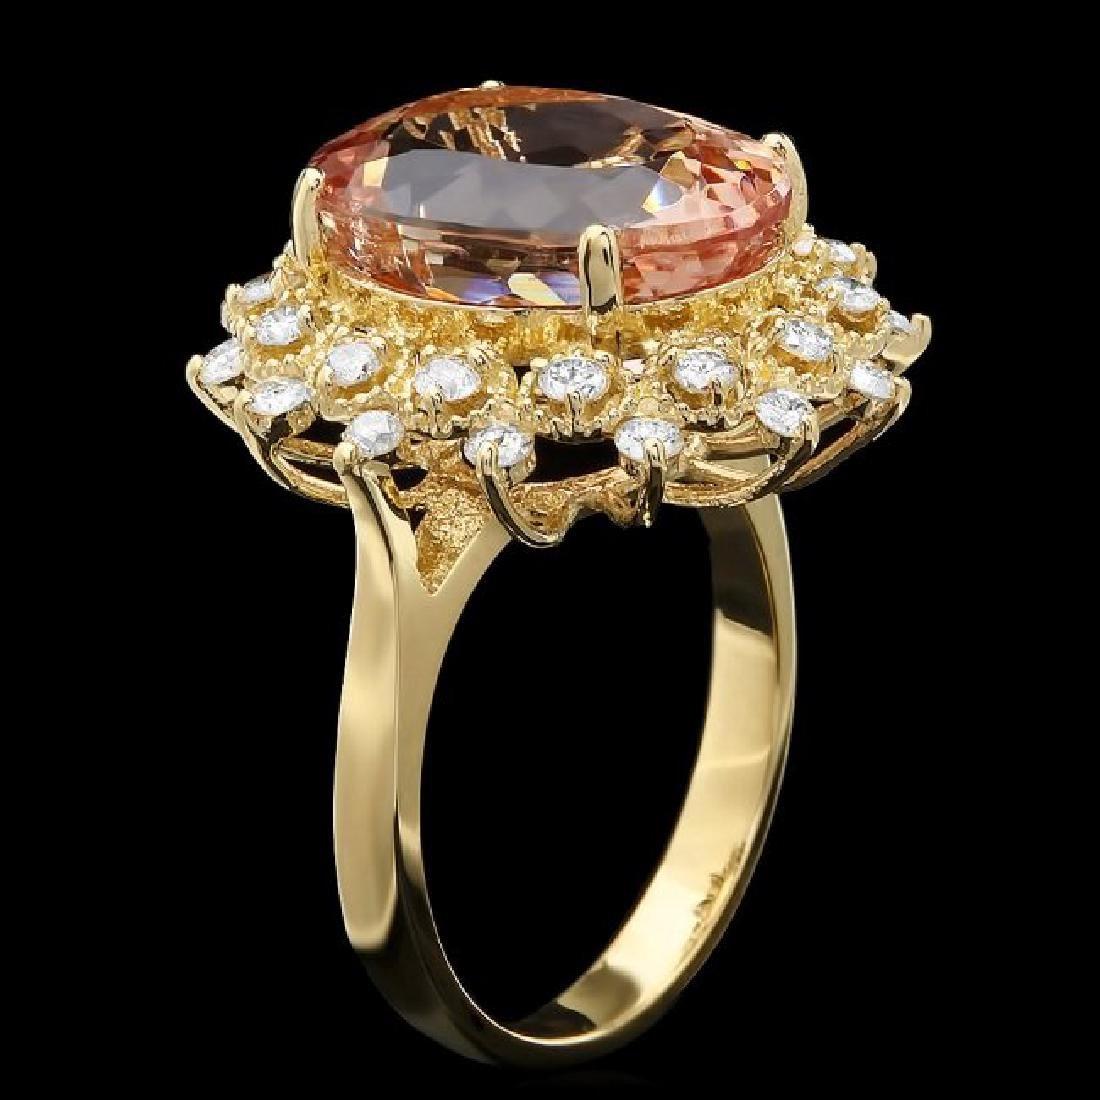 14k Gold 7.80ct Morganite 0.80ct Diamond Ring - 2